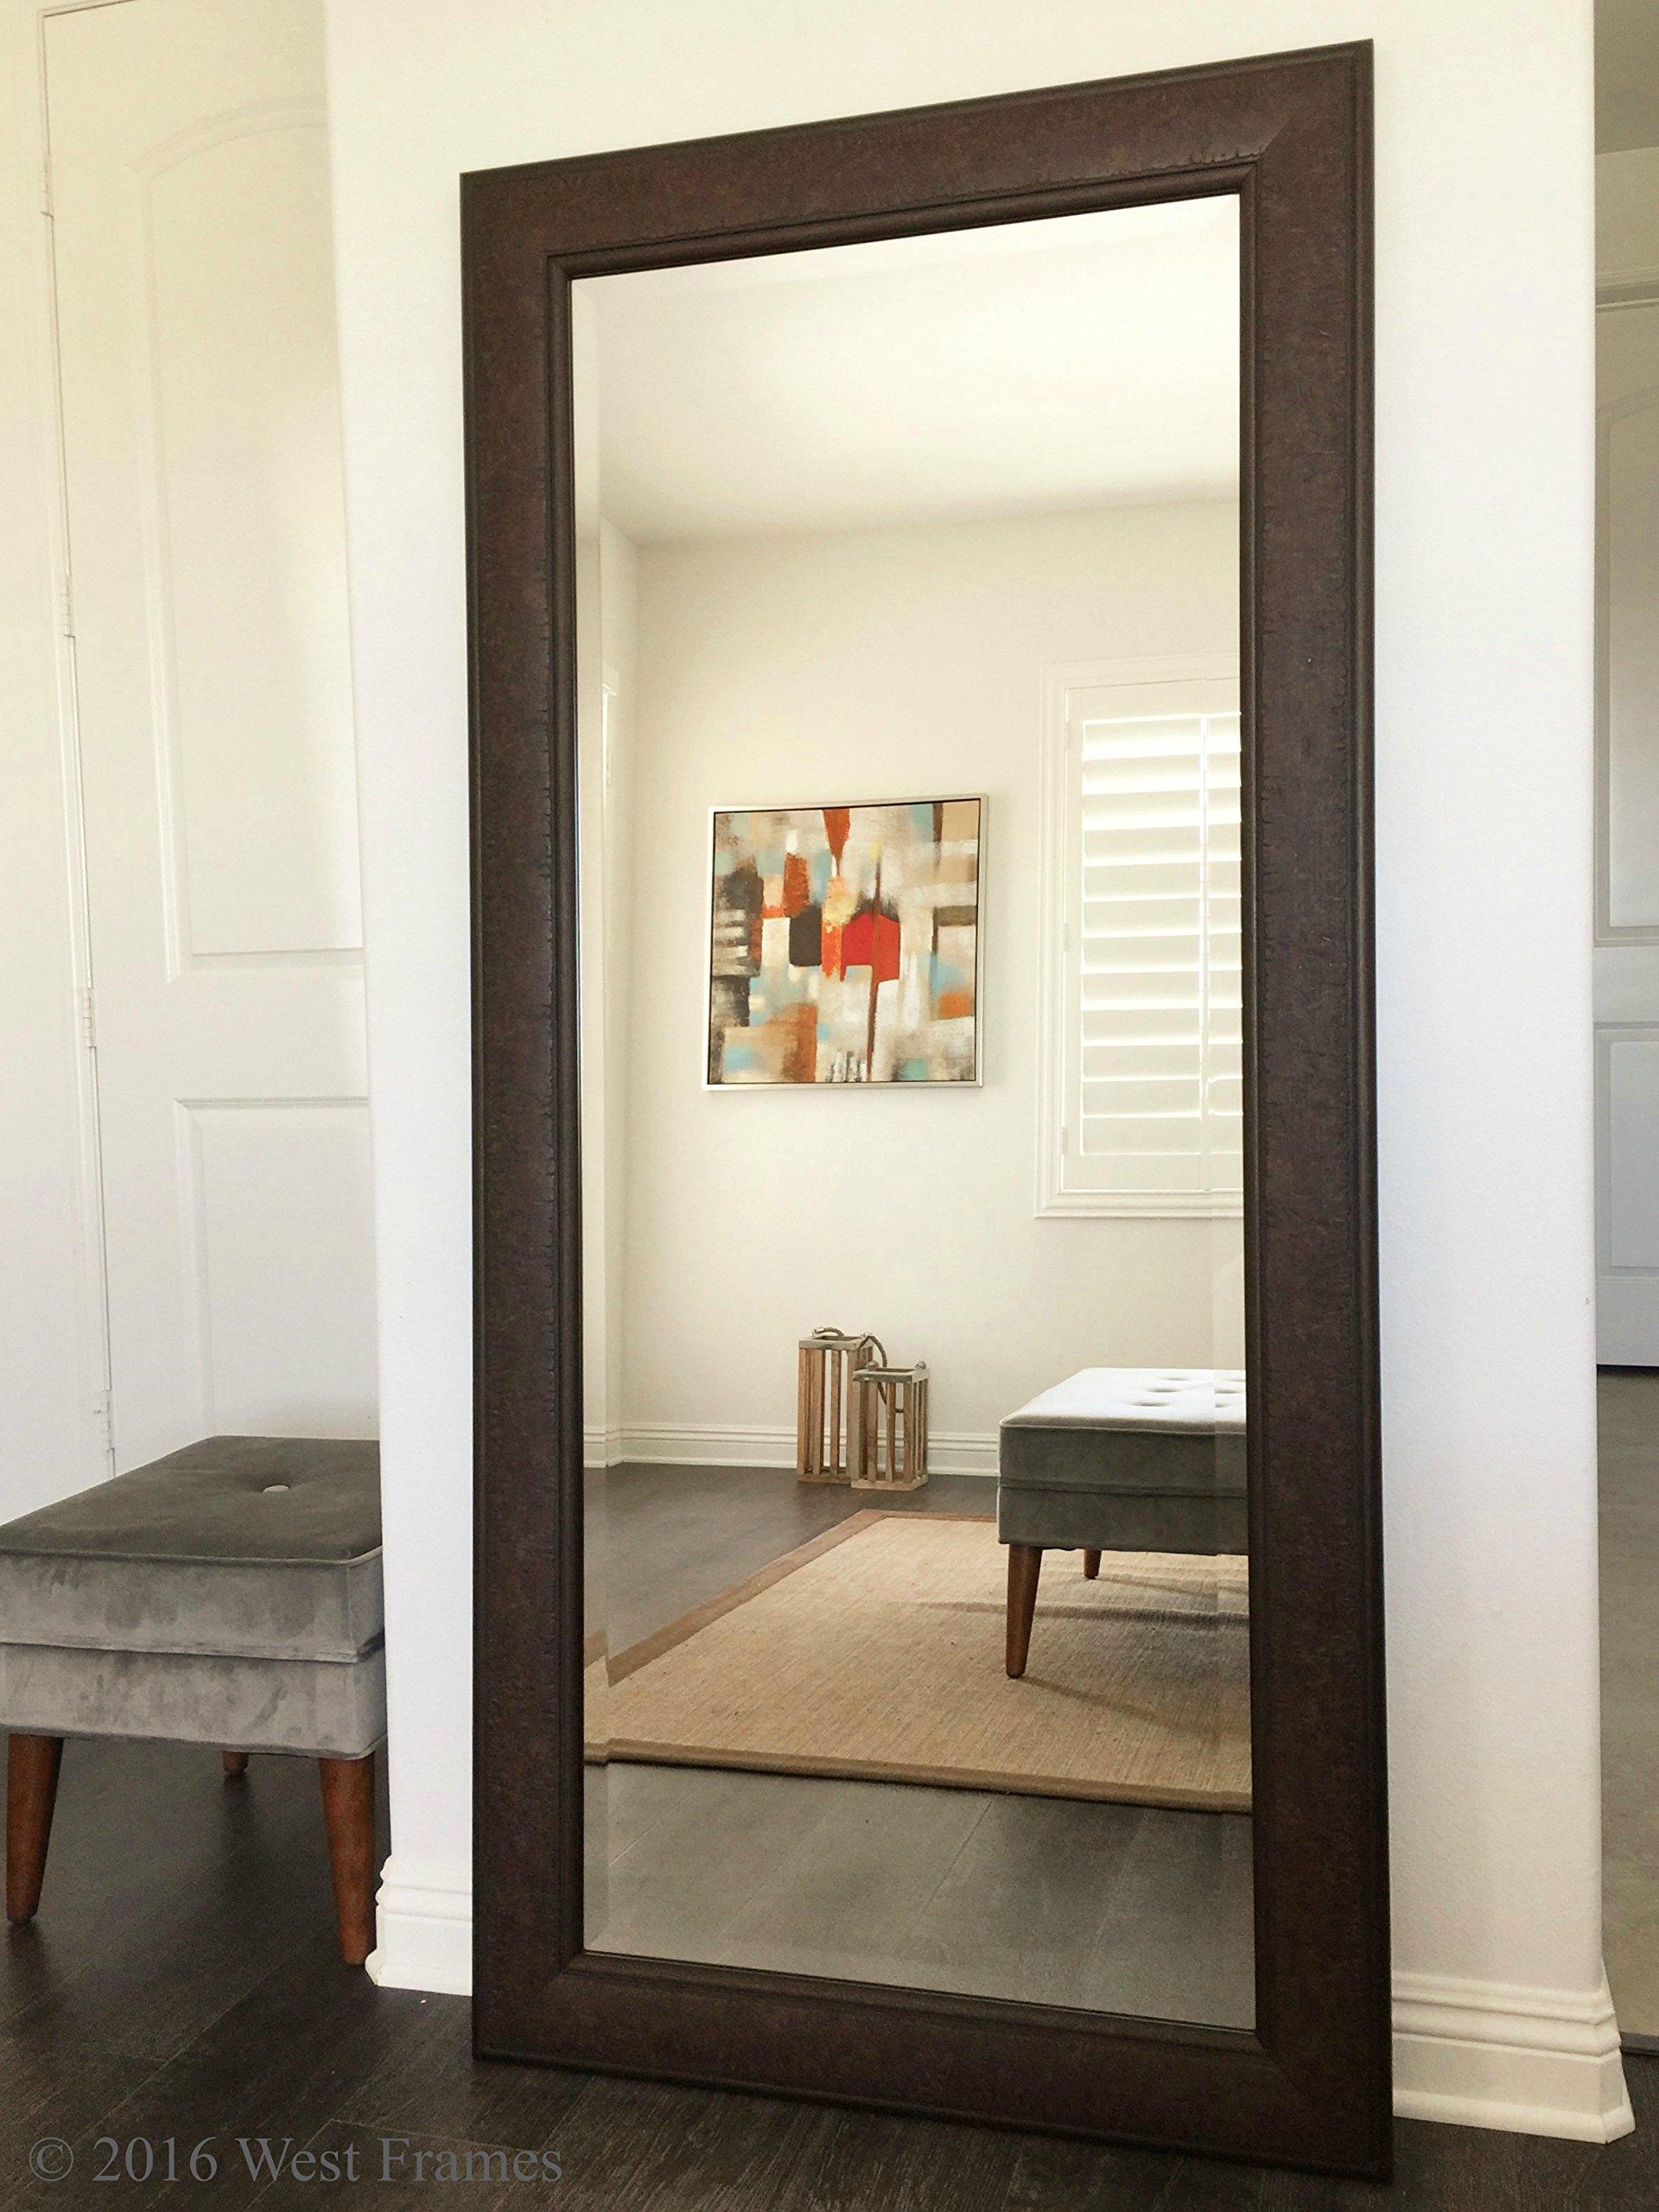 Get Quotations · West Frames Marcello Full Floor Rustic Walnut Brown Mirror